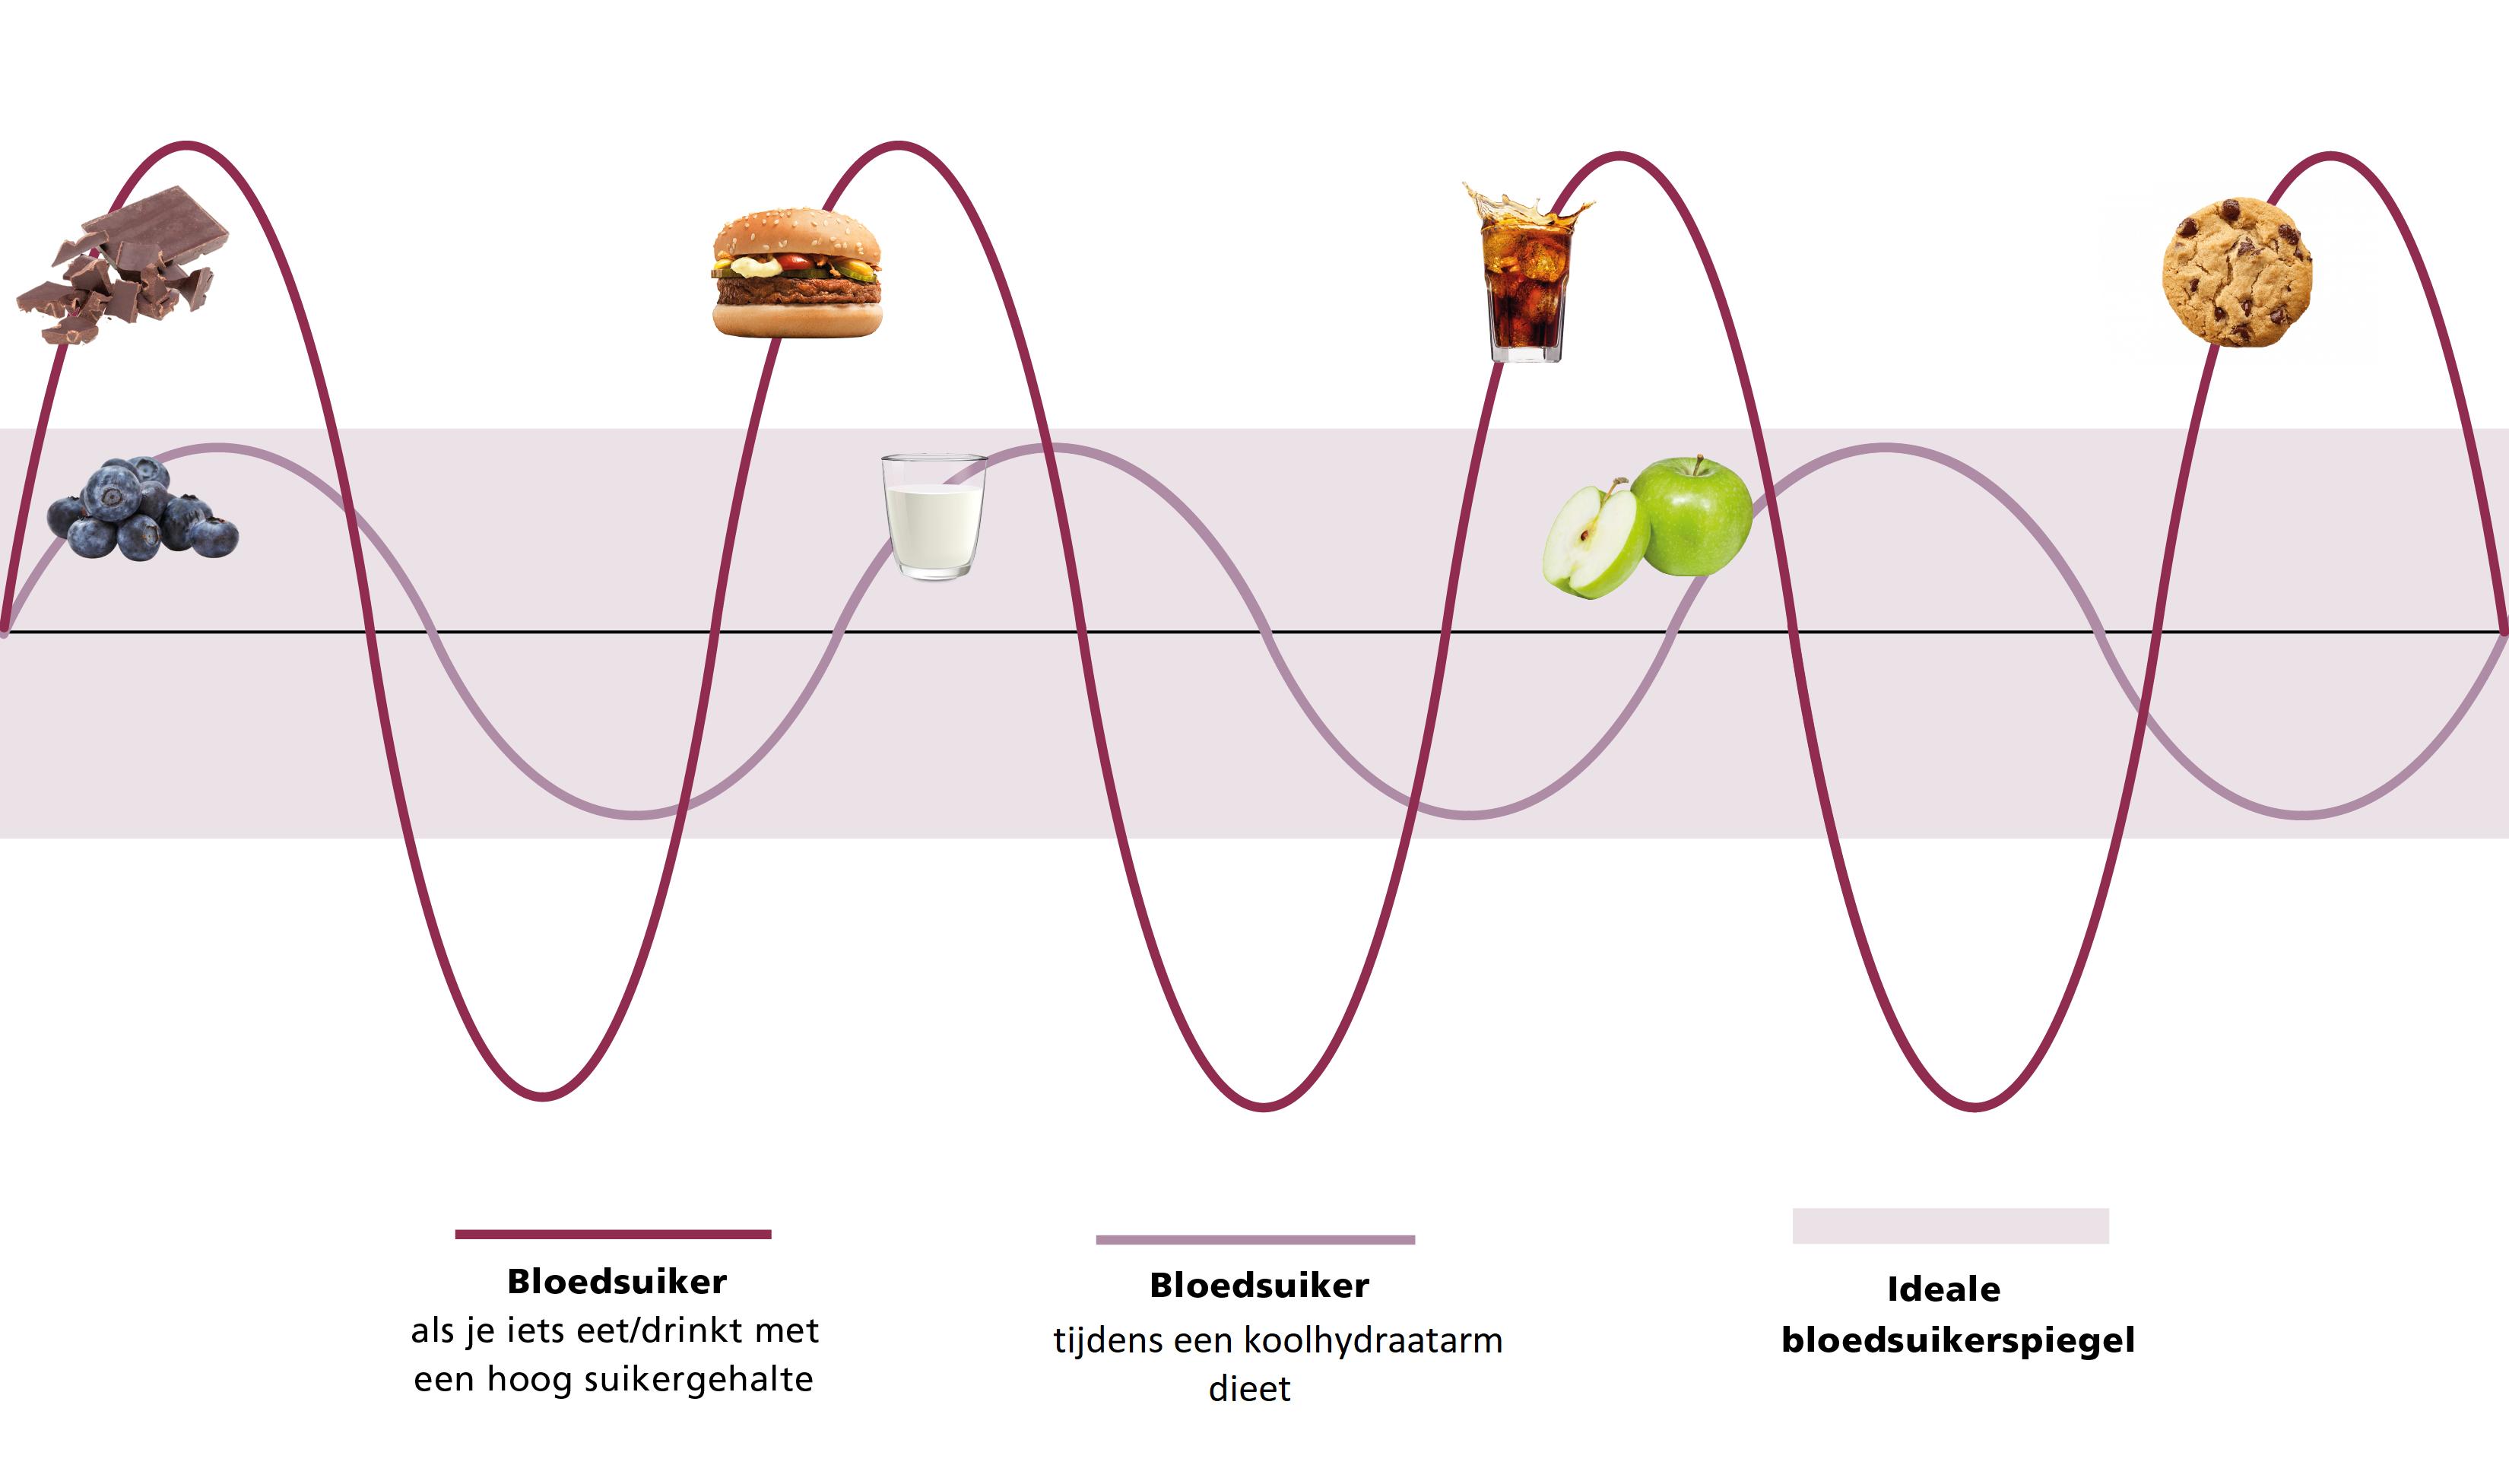 Koolhydraatarm dieet stabiele bloedsuikerspiegel